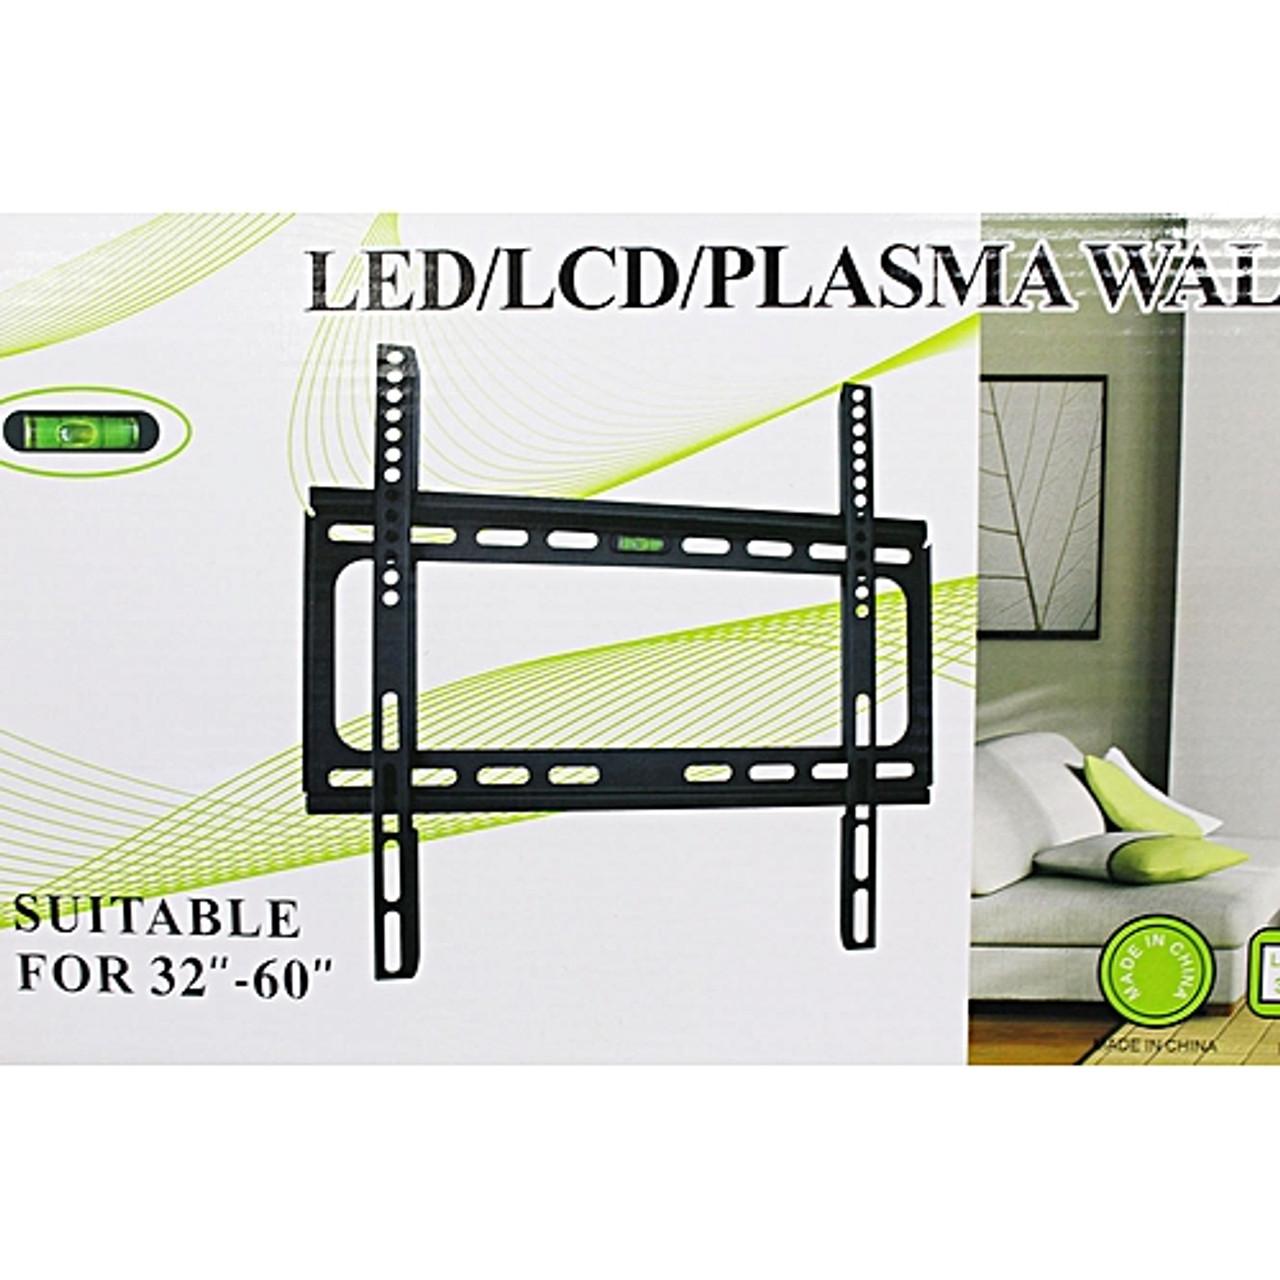 "LED 32"" - 60"" Wall Mount AD-AM41 (Load capacity -50Kg) - Black"